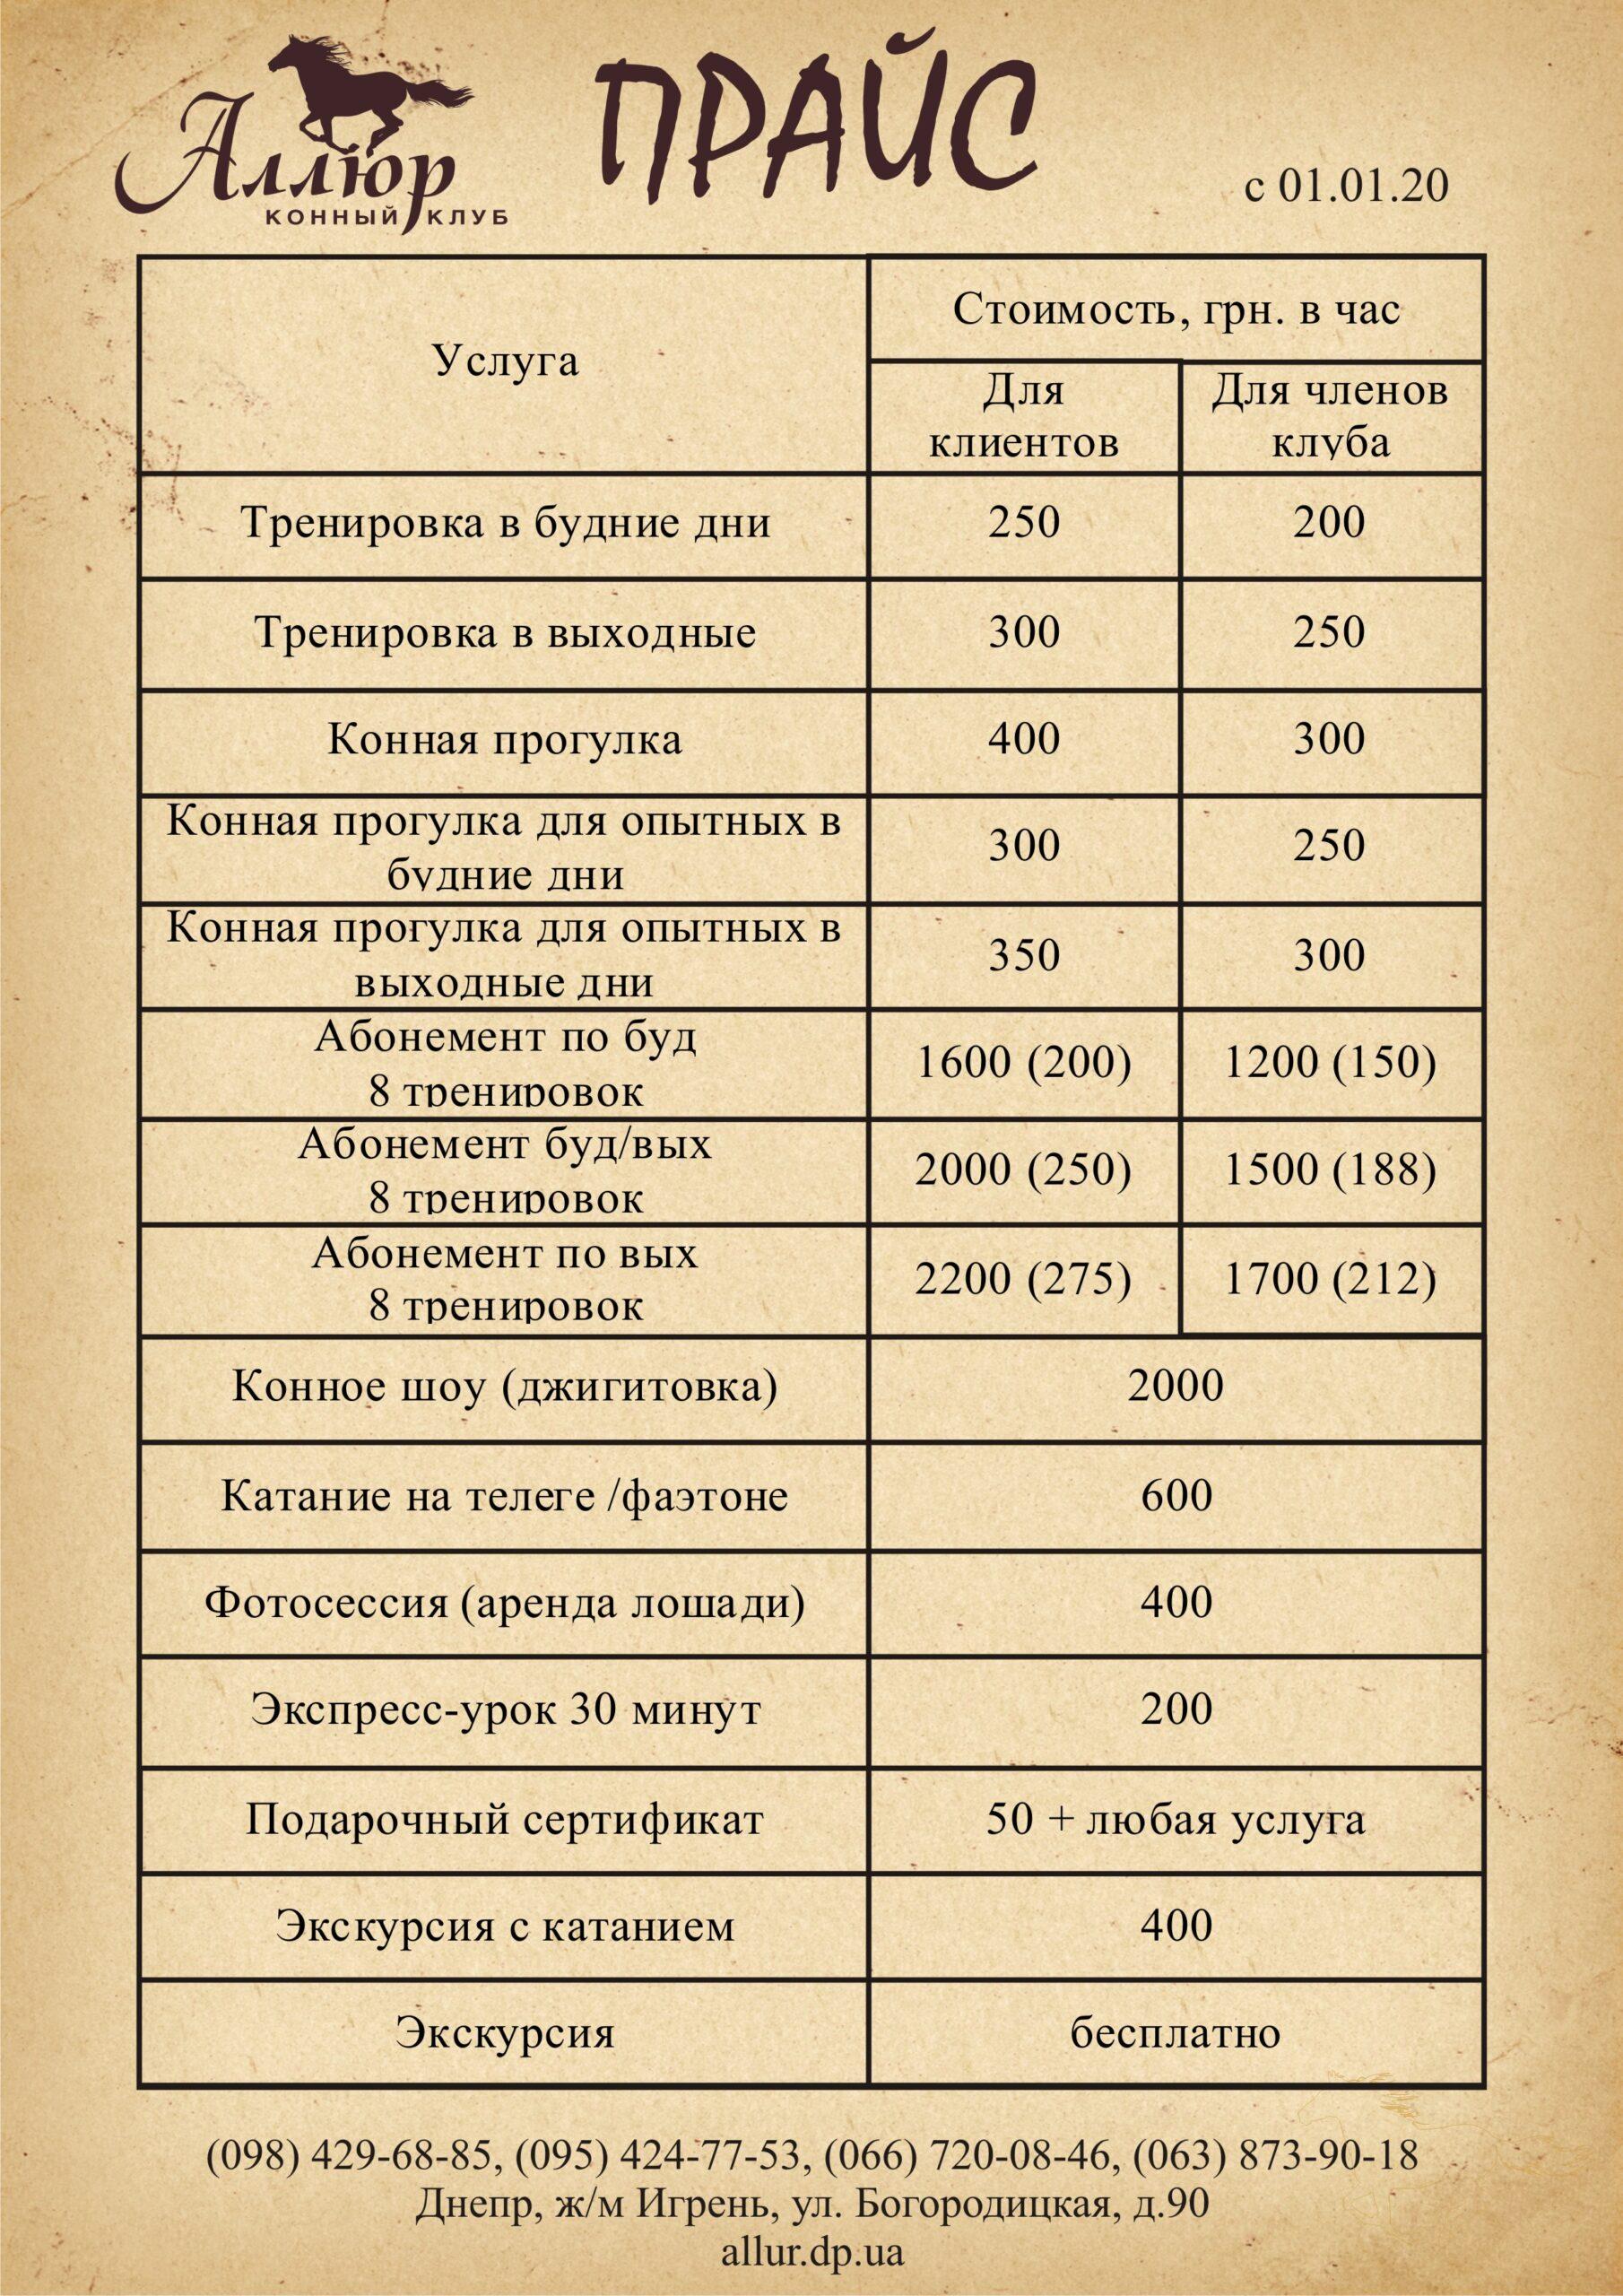 Конный клуб АЛЛЮР цены на 2020 год